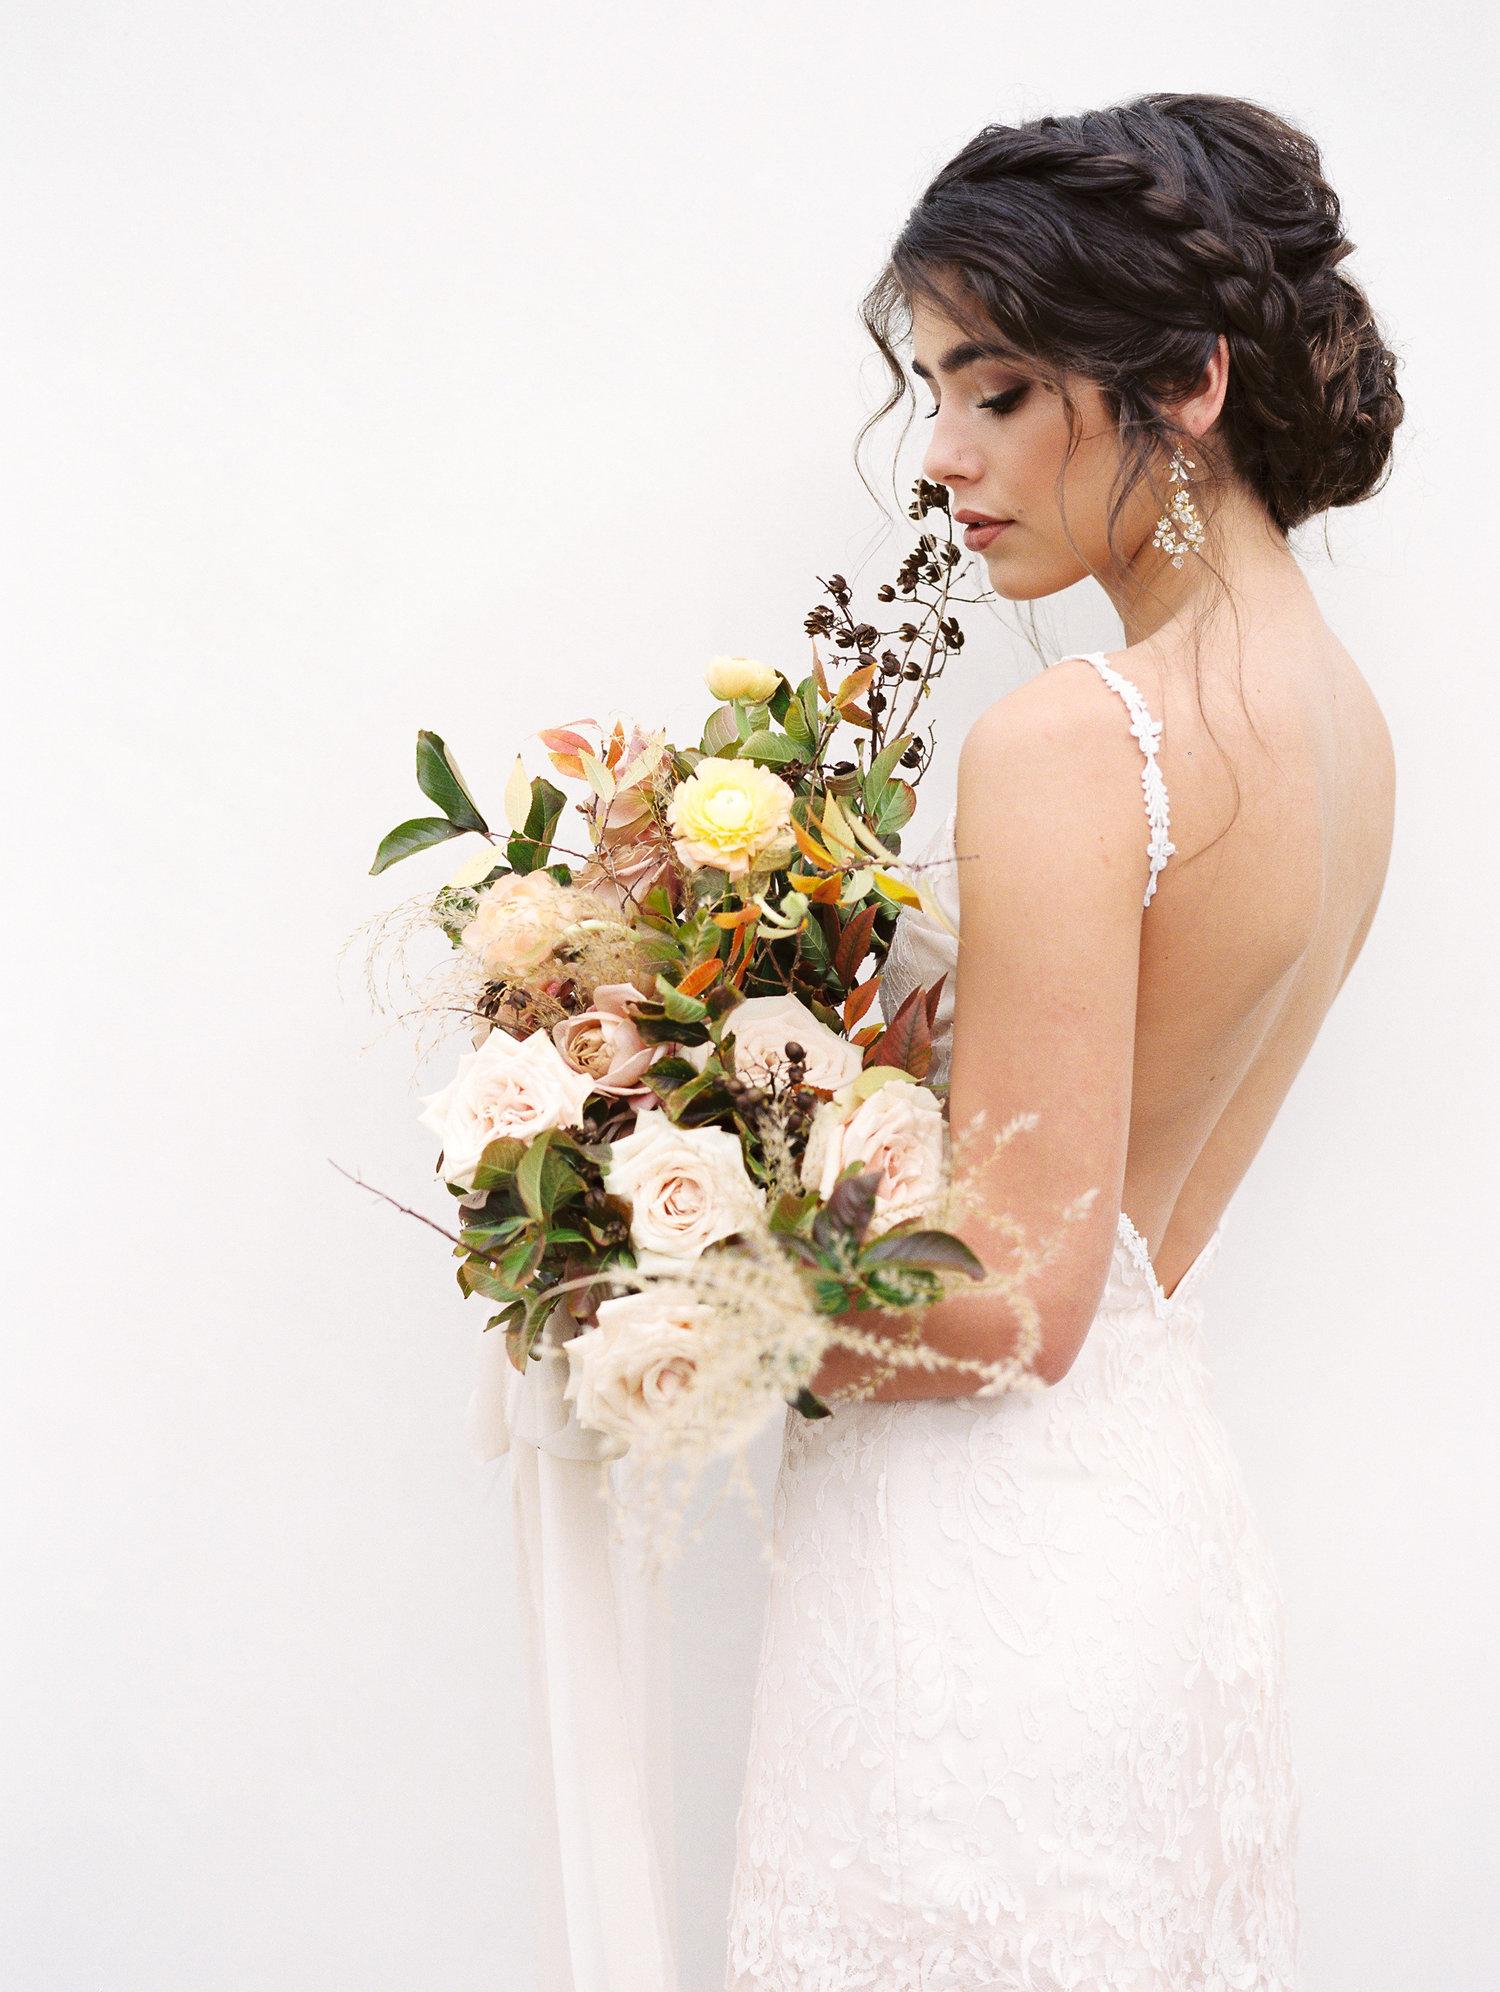 Rosemary_Beach_Florida_Wedding_Fallen_Photography-108.JPG